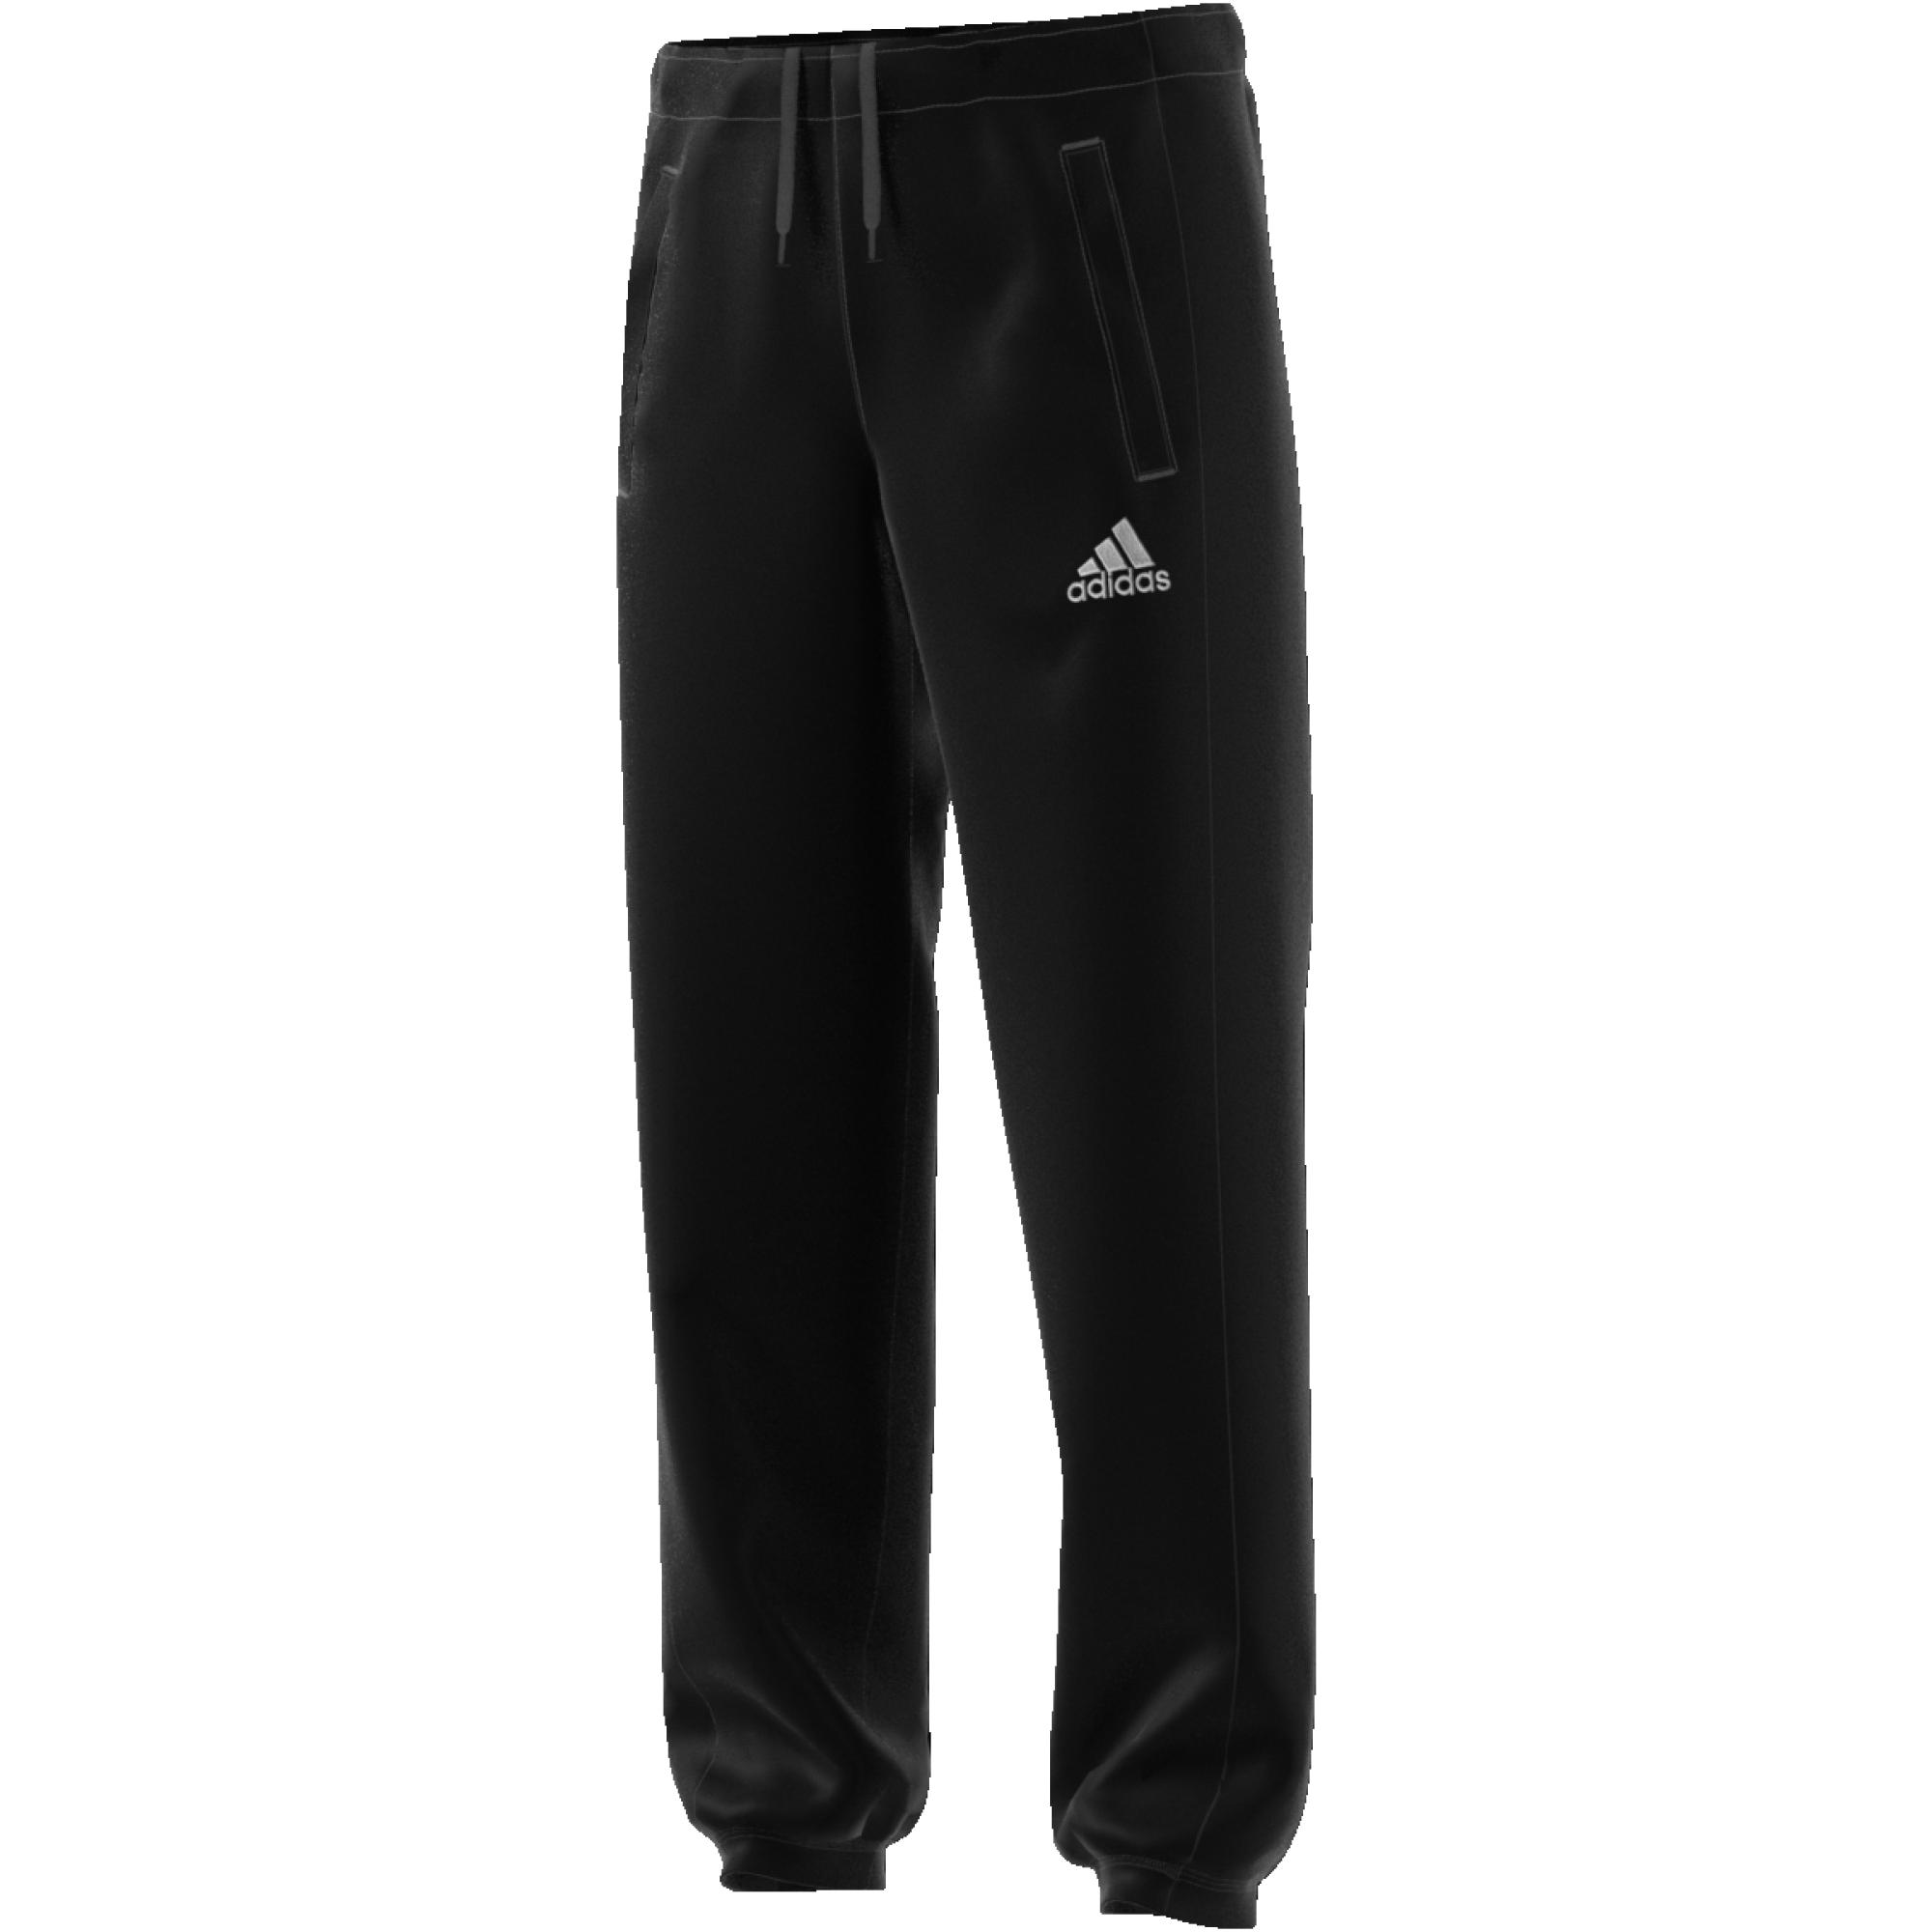 Ferguslie CC Adidas Black Sweat Pants